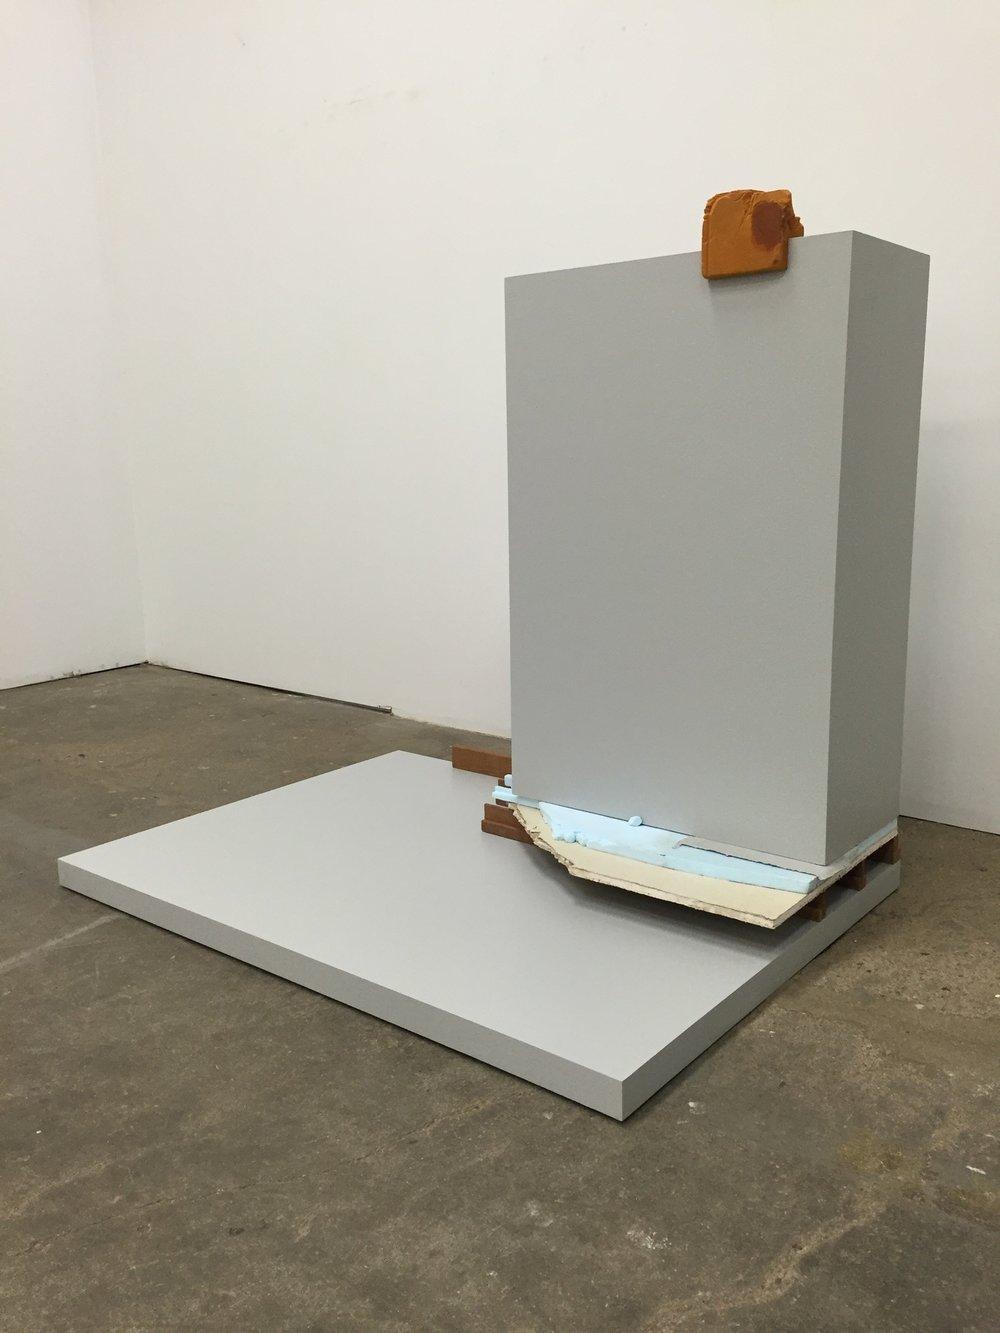 Josh Johnson,  Outcropping,  2016, balsa foam, polystyrene, sheet rock, cedar, plywood, latex paint